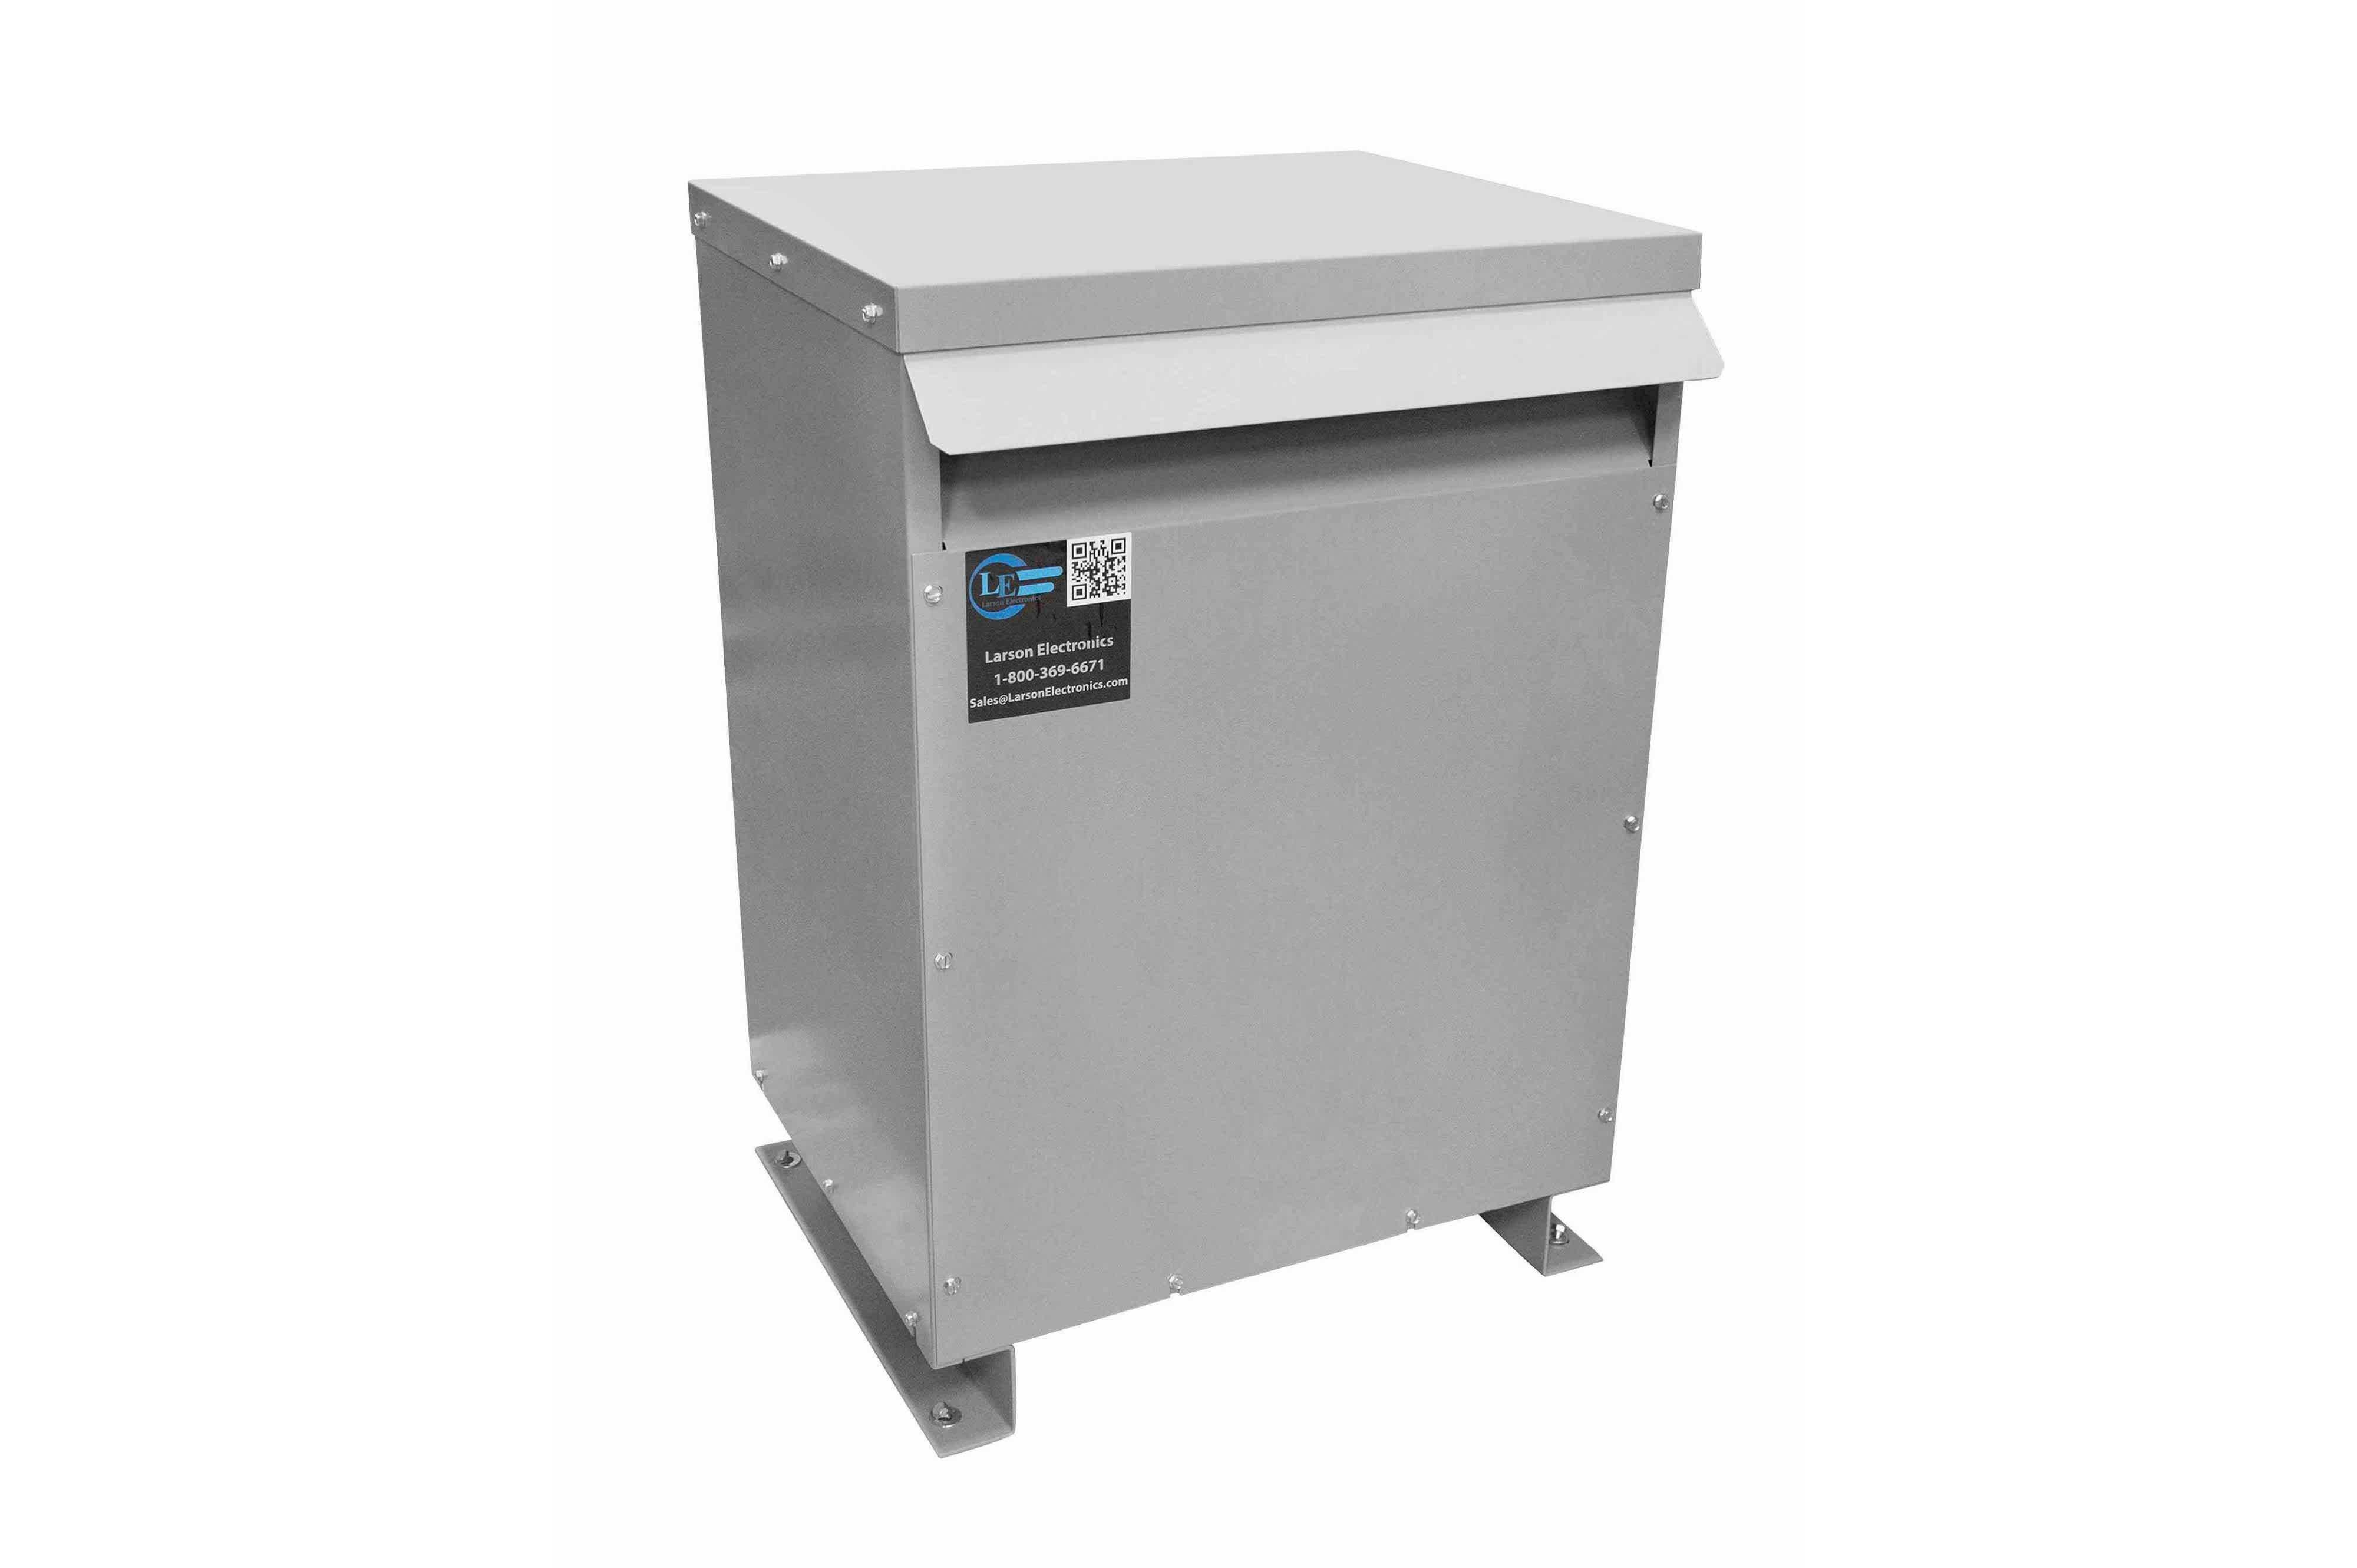 275 kVA 3PH Isolation Transformer, 480V Wye Primary, 480V Delta Secondary, N3R, Ventilated, 60 Hz